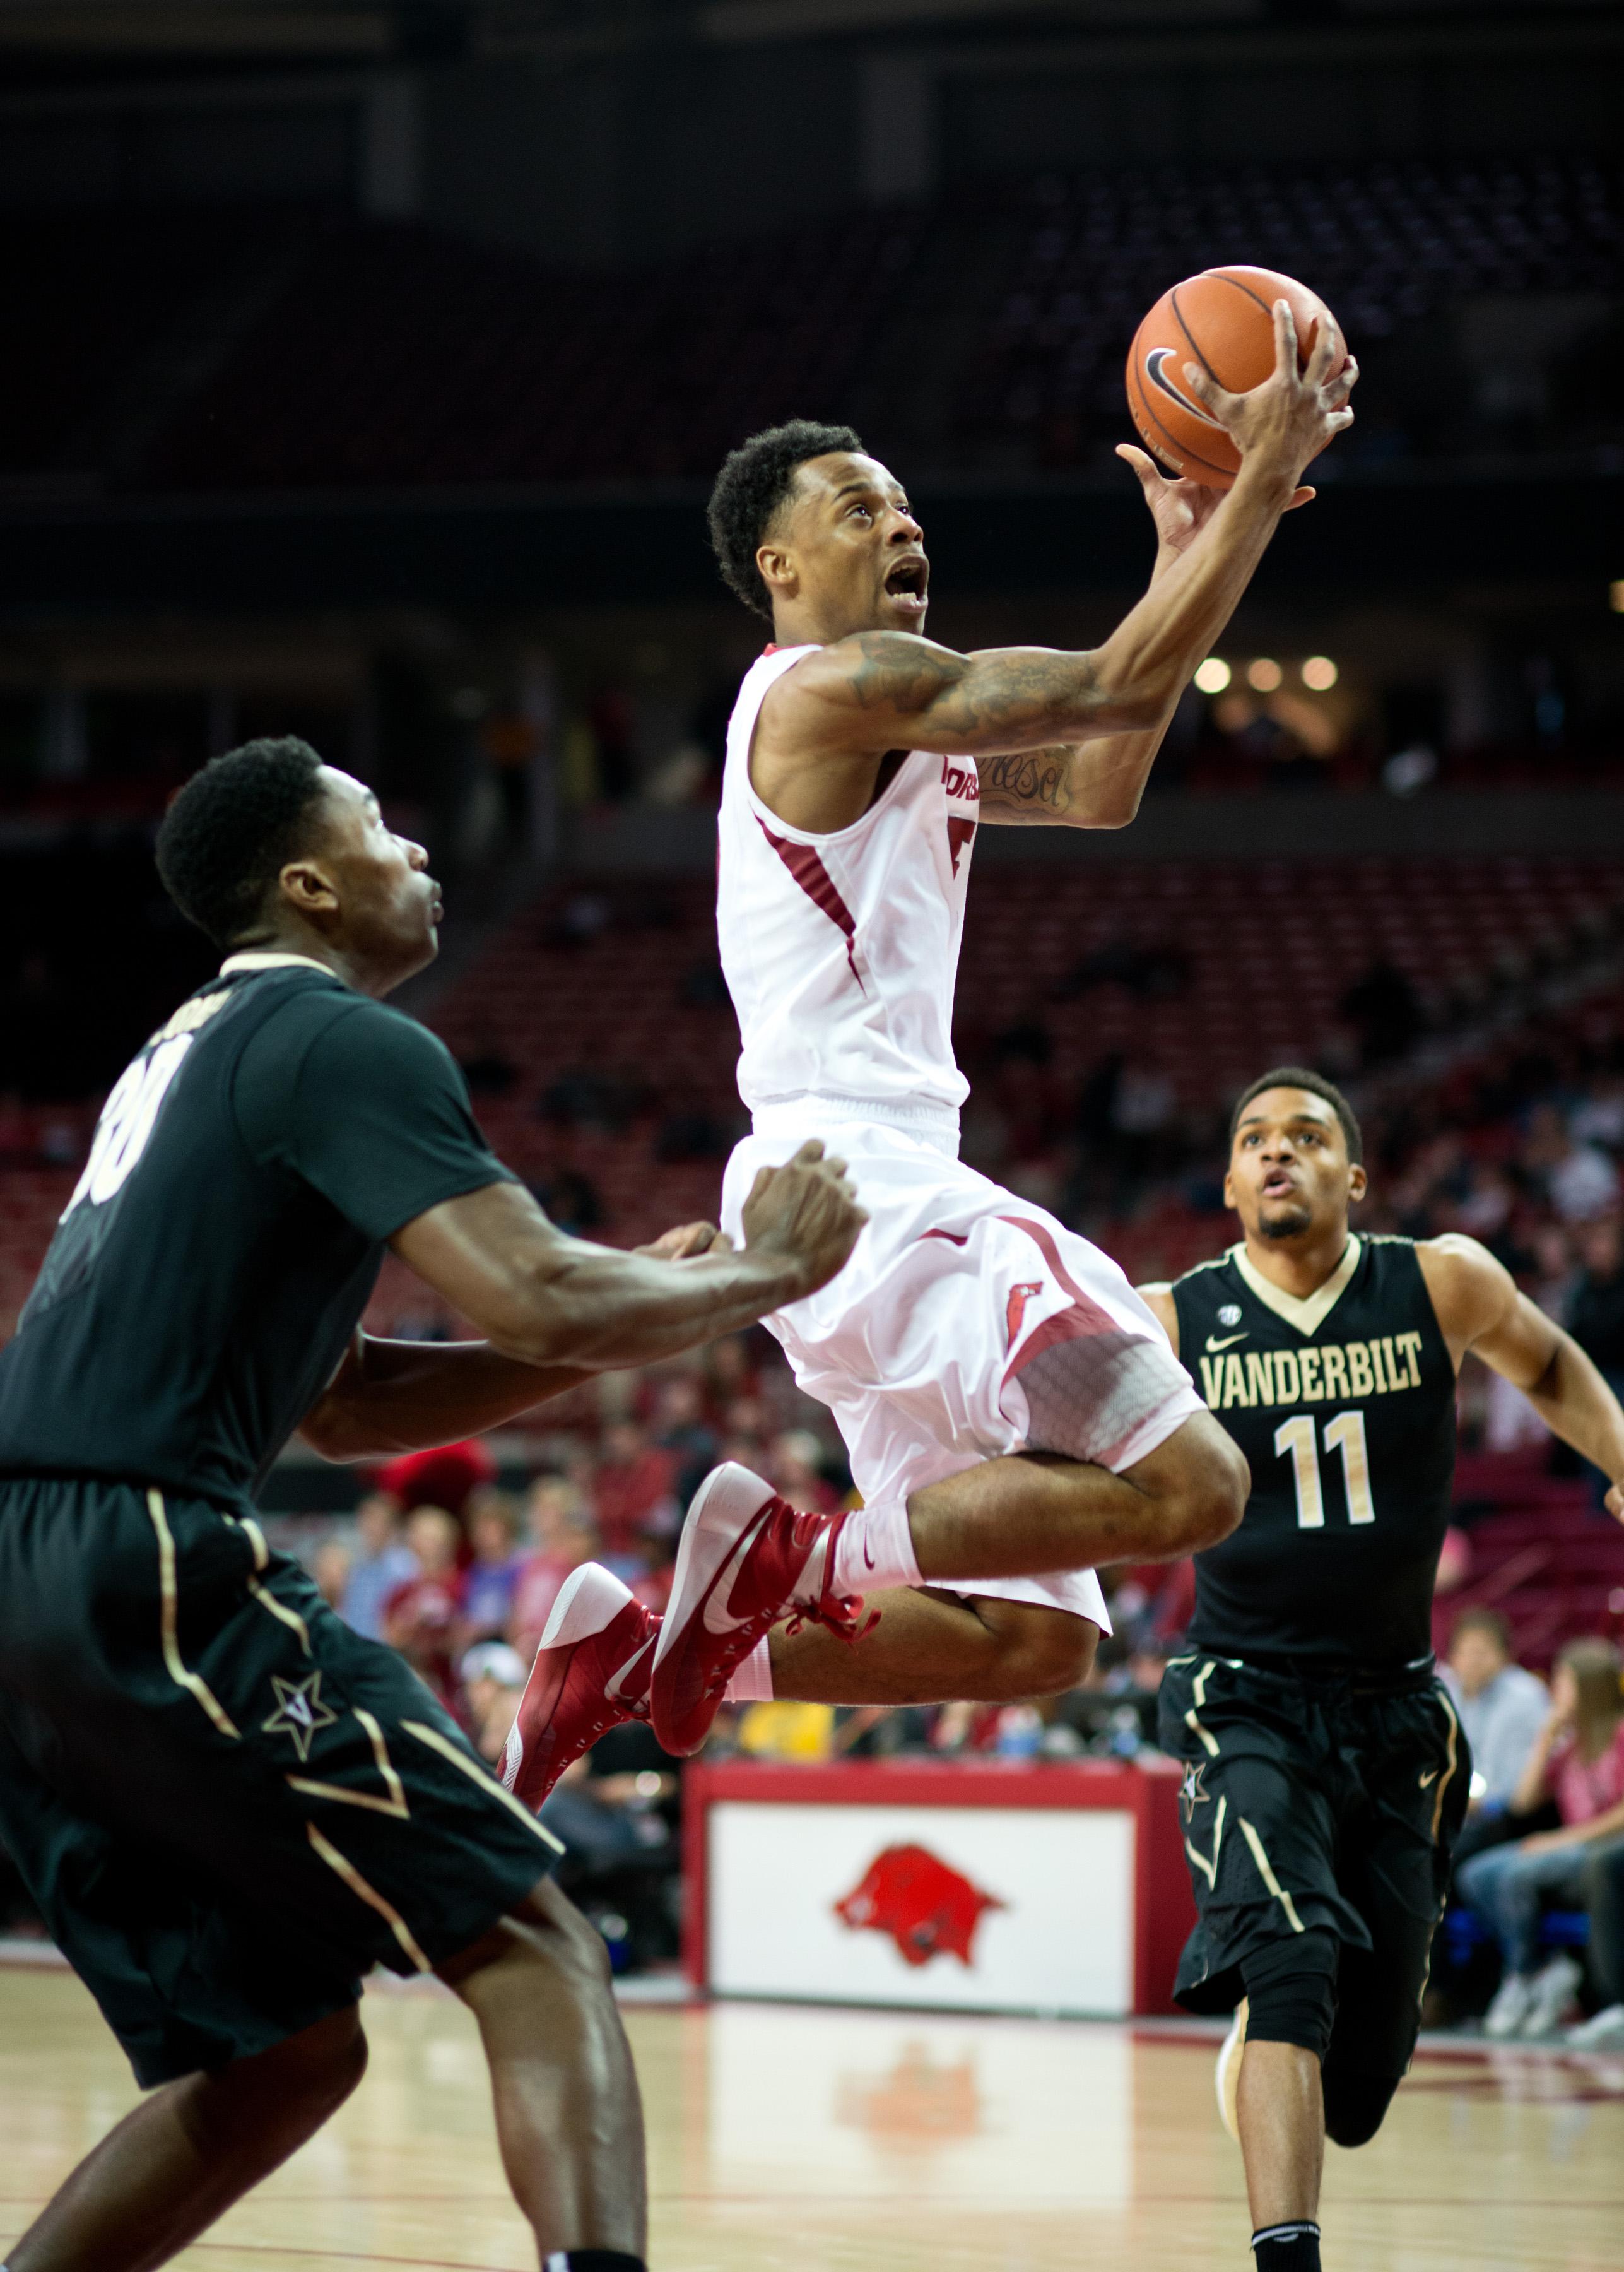 Arkansas' Athlon Bell (5) shoots a basket over Vanderbilt's Damian Jones (30) Jeff Roberson (11), right, in the first half of an NCAA college basketball game in Fayetteville, Ark., Tuesday, Jan. 5, 2016. (AP Photo/Sarah Bentham)